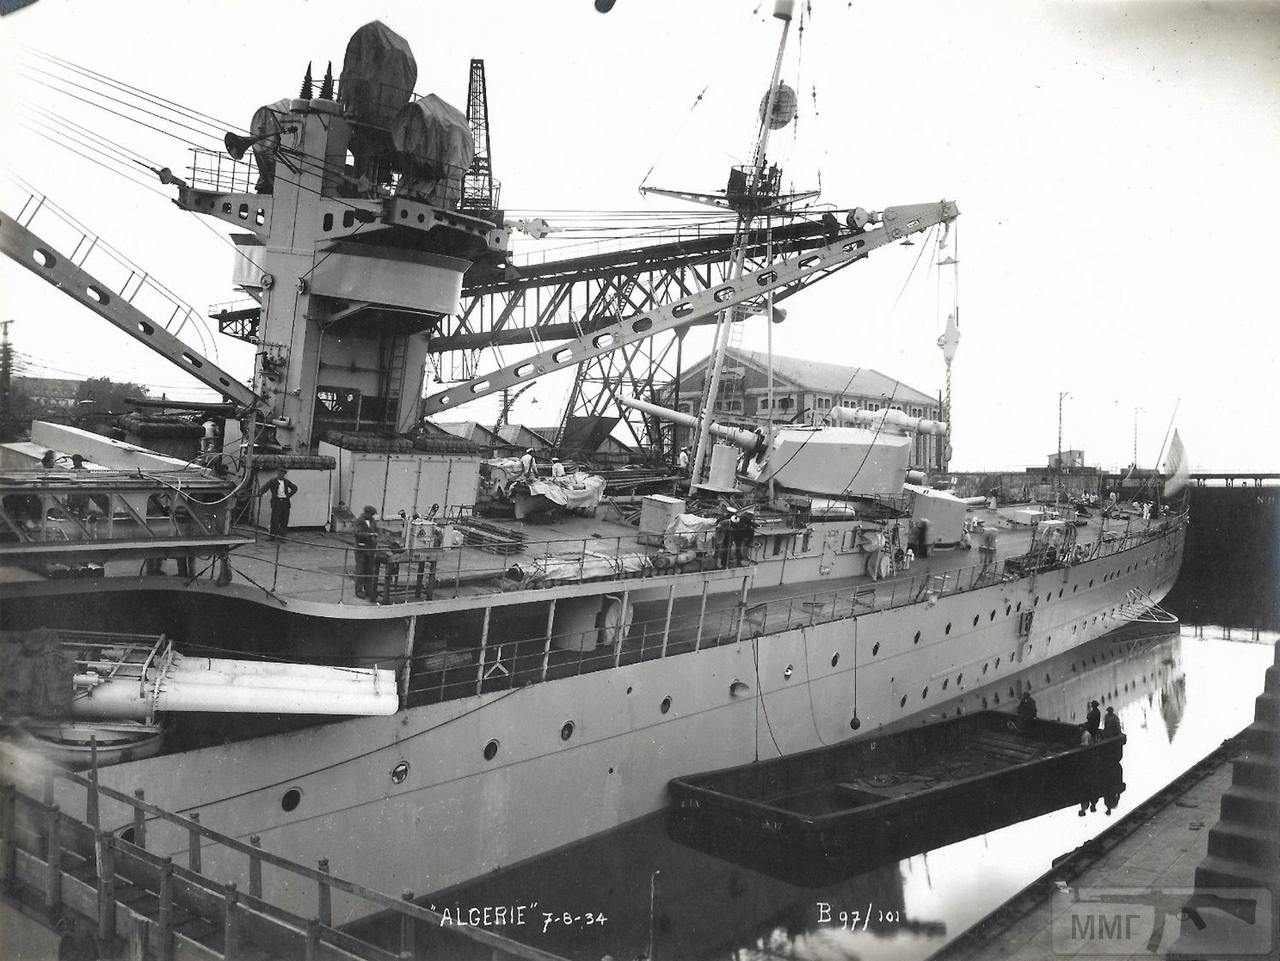 40114 - Тяжелый крейсер Algerie на креновании, 7 августа 1934 г.